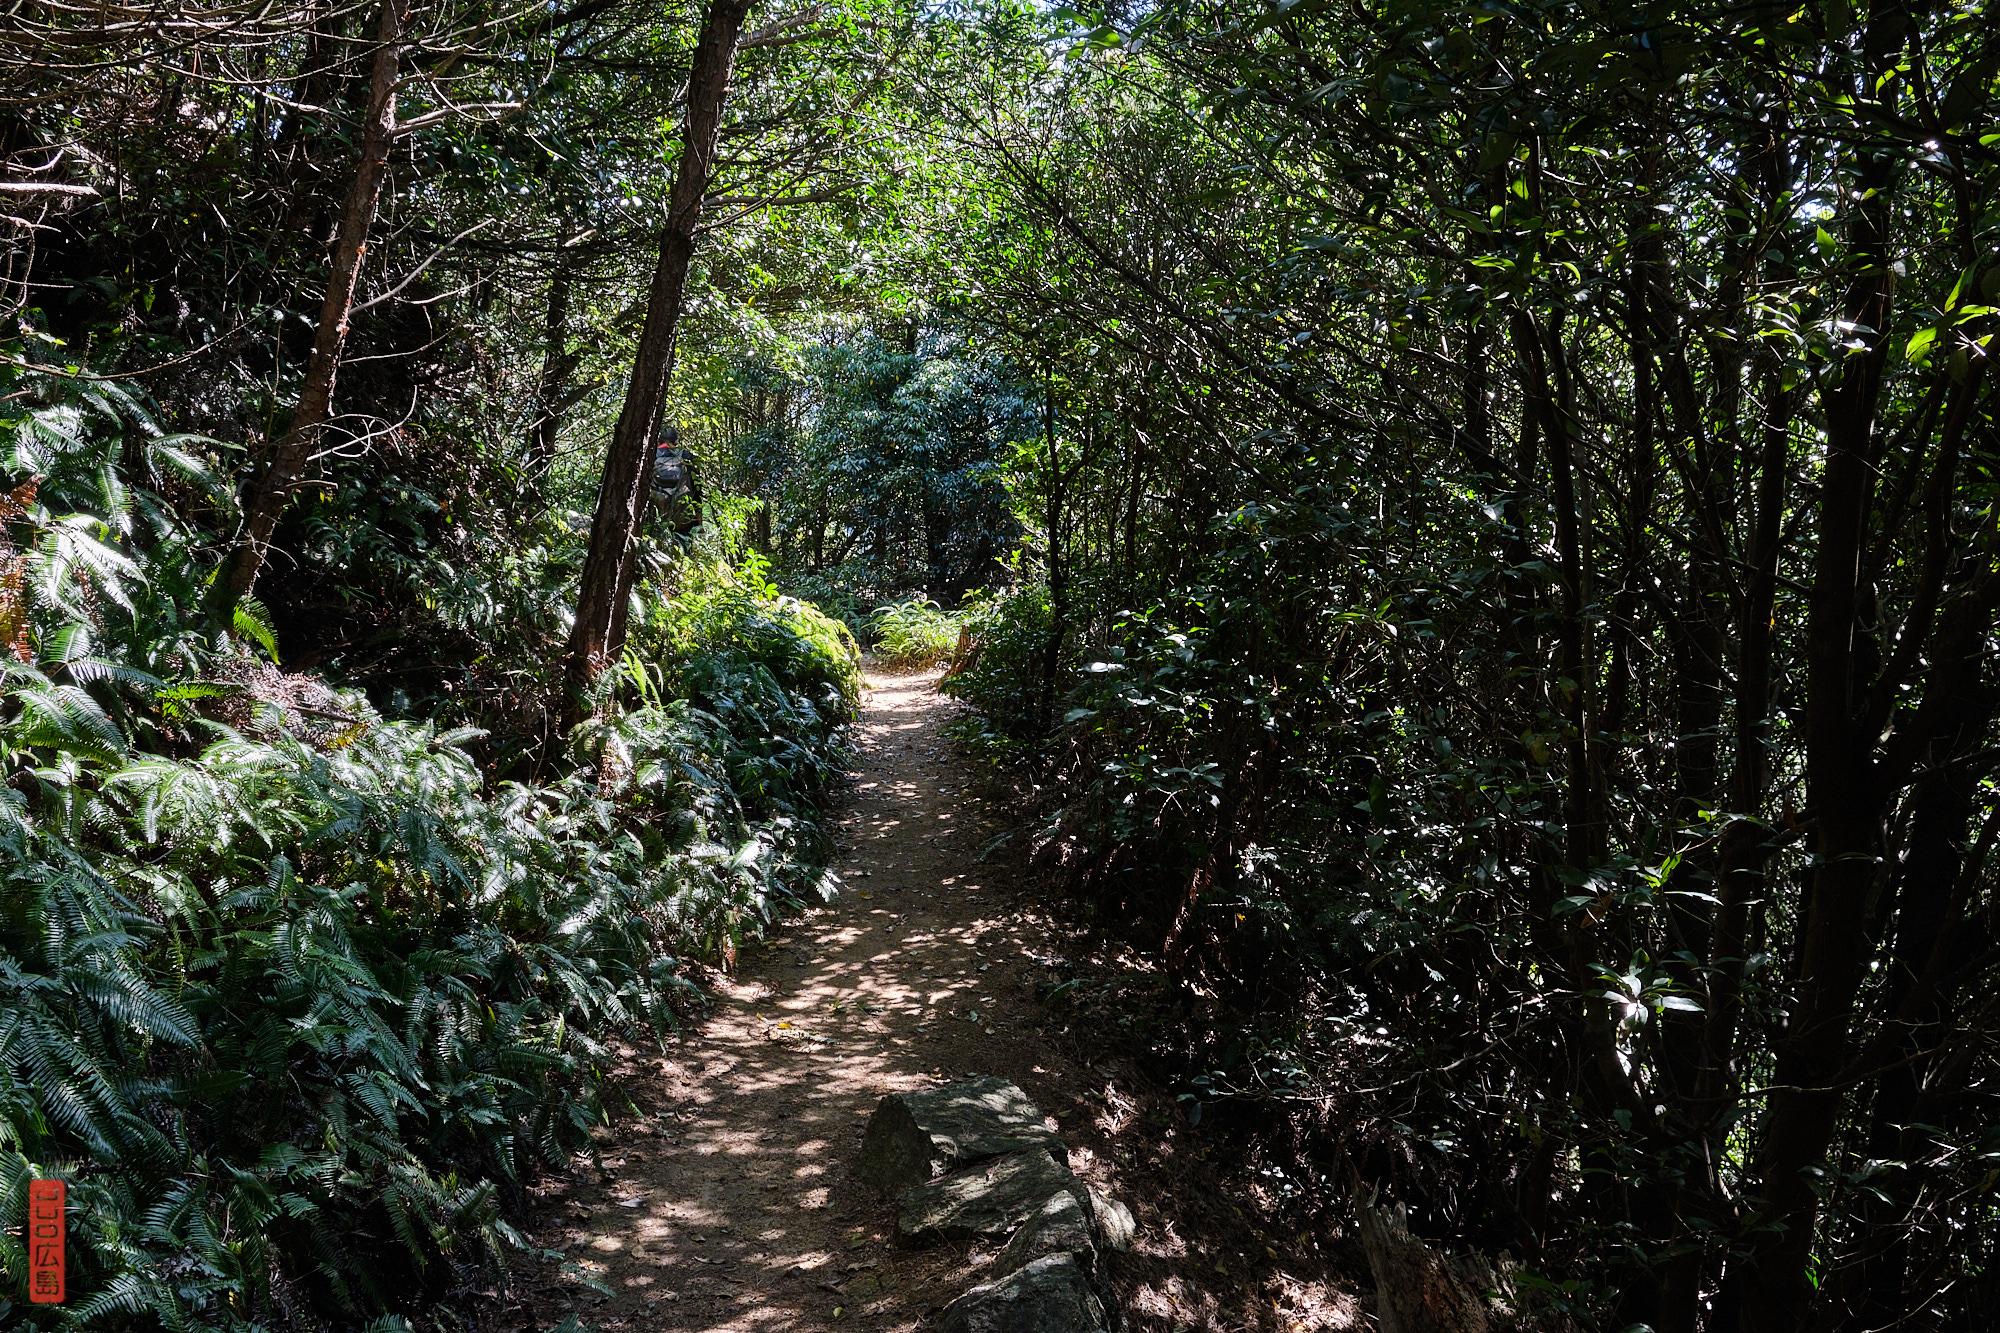 sentier de randonnée près du mont Komagabayashi, Miyajima